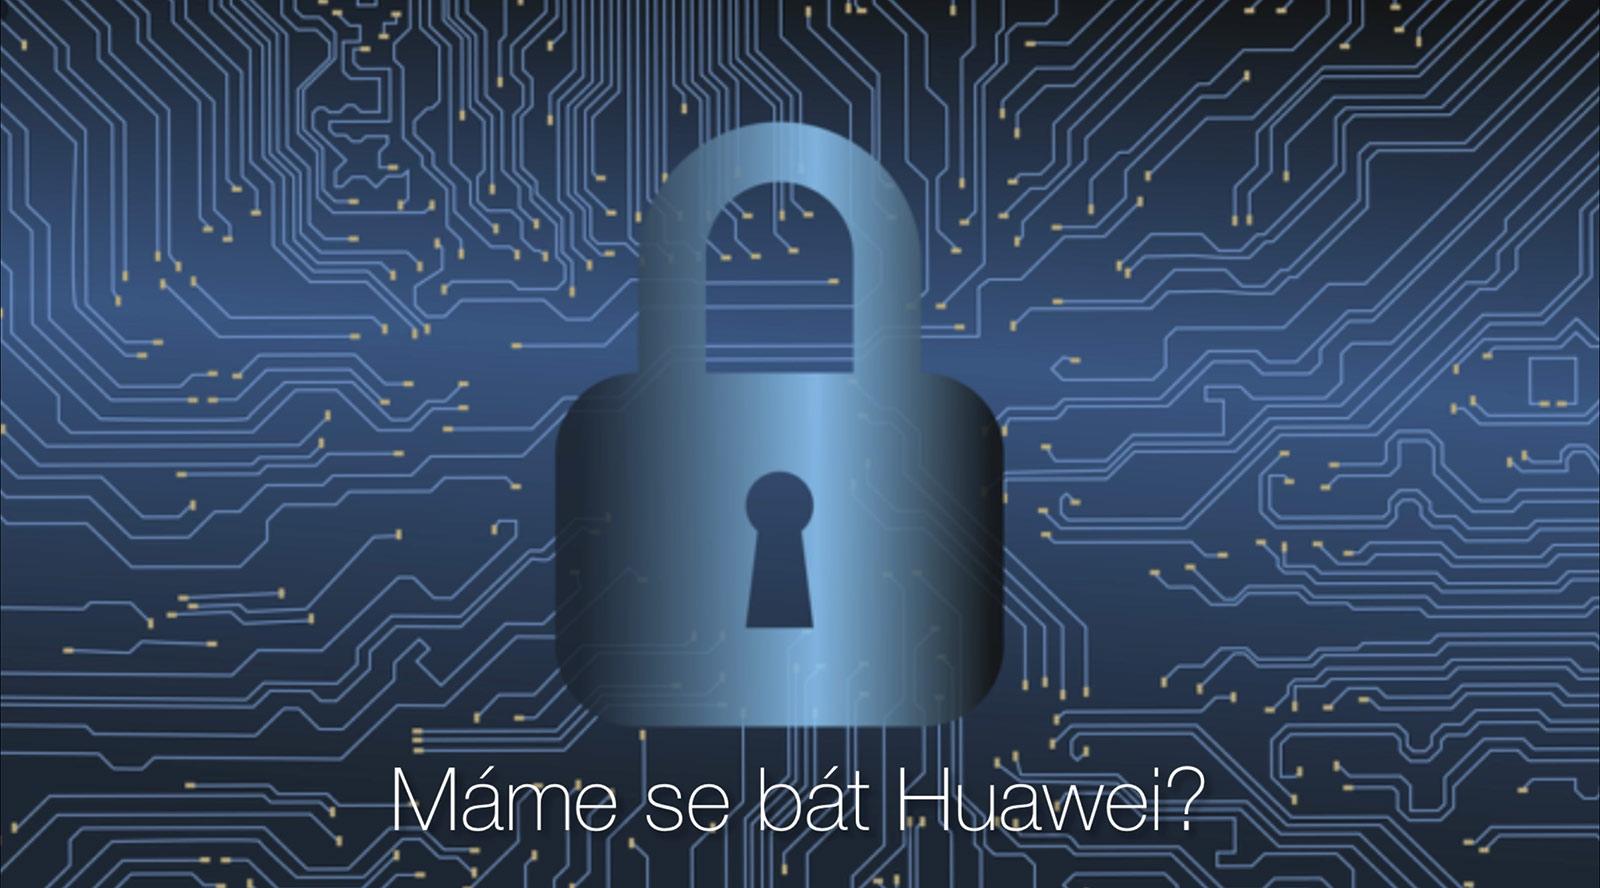 Máme se bát Huawei